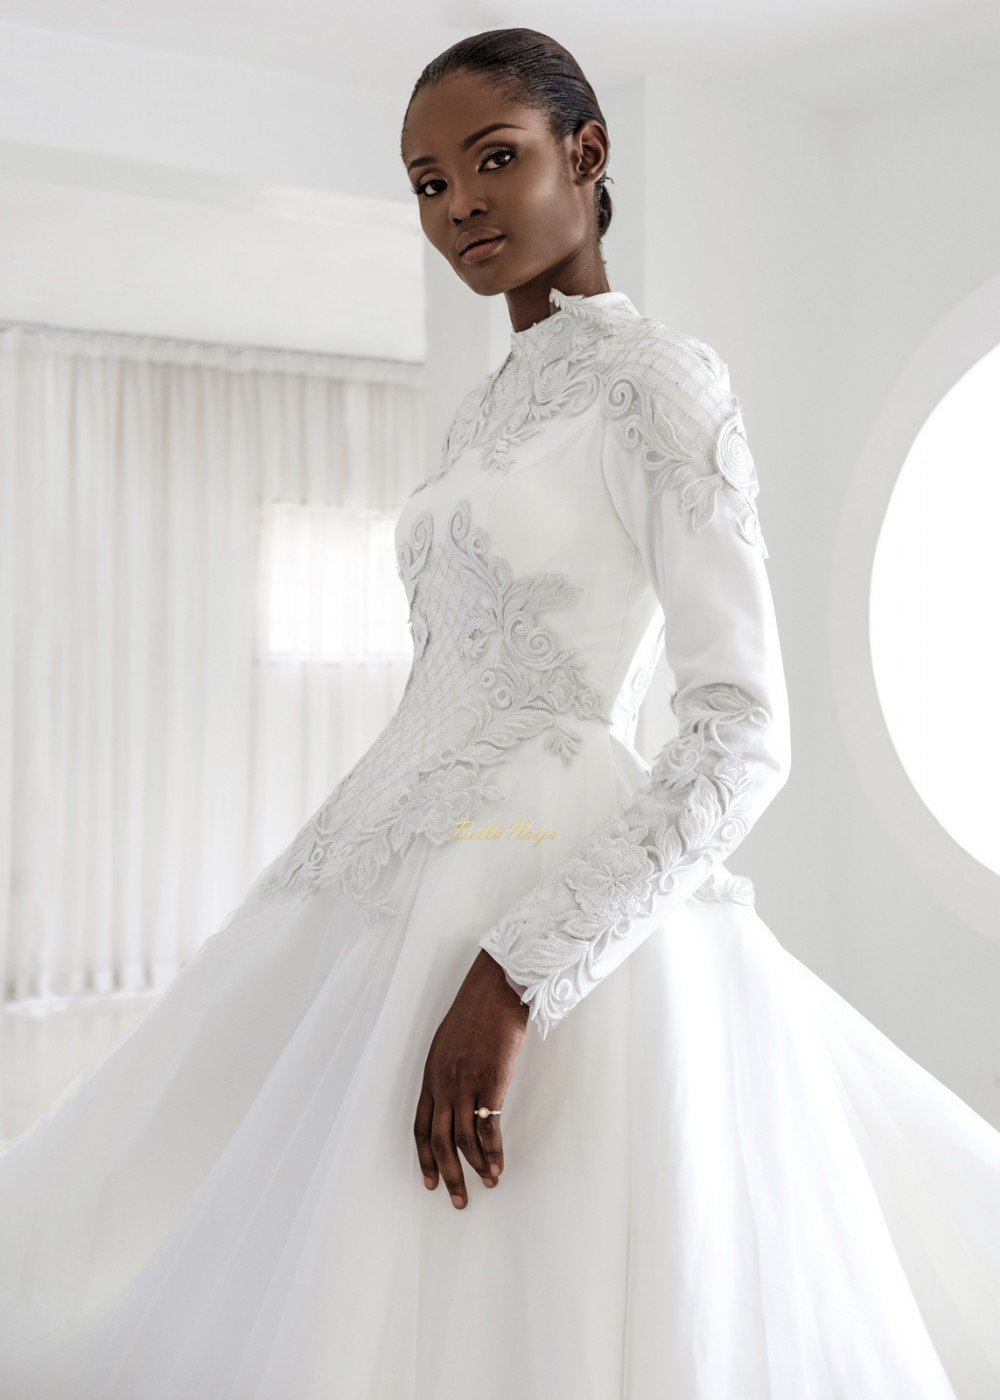 Wedding Dress Steamer 38 Vintage The Andrea Iyamah bridal